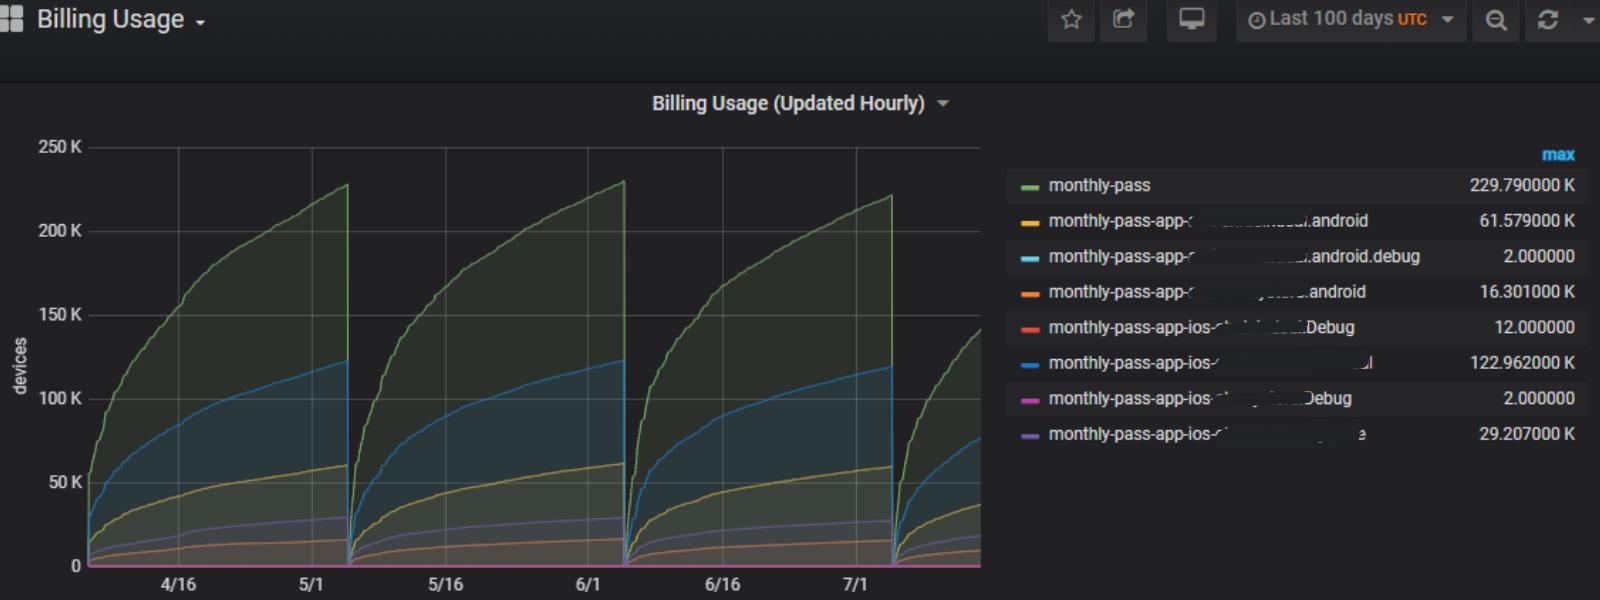 Screenshot of Approov customer metrics graph showing billing usage